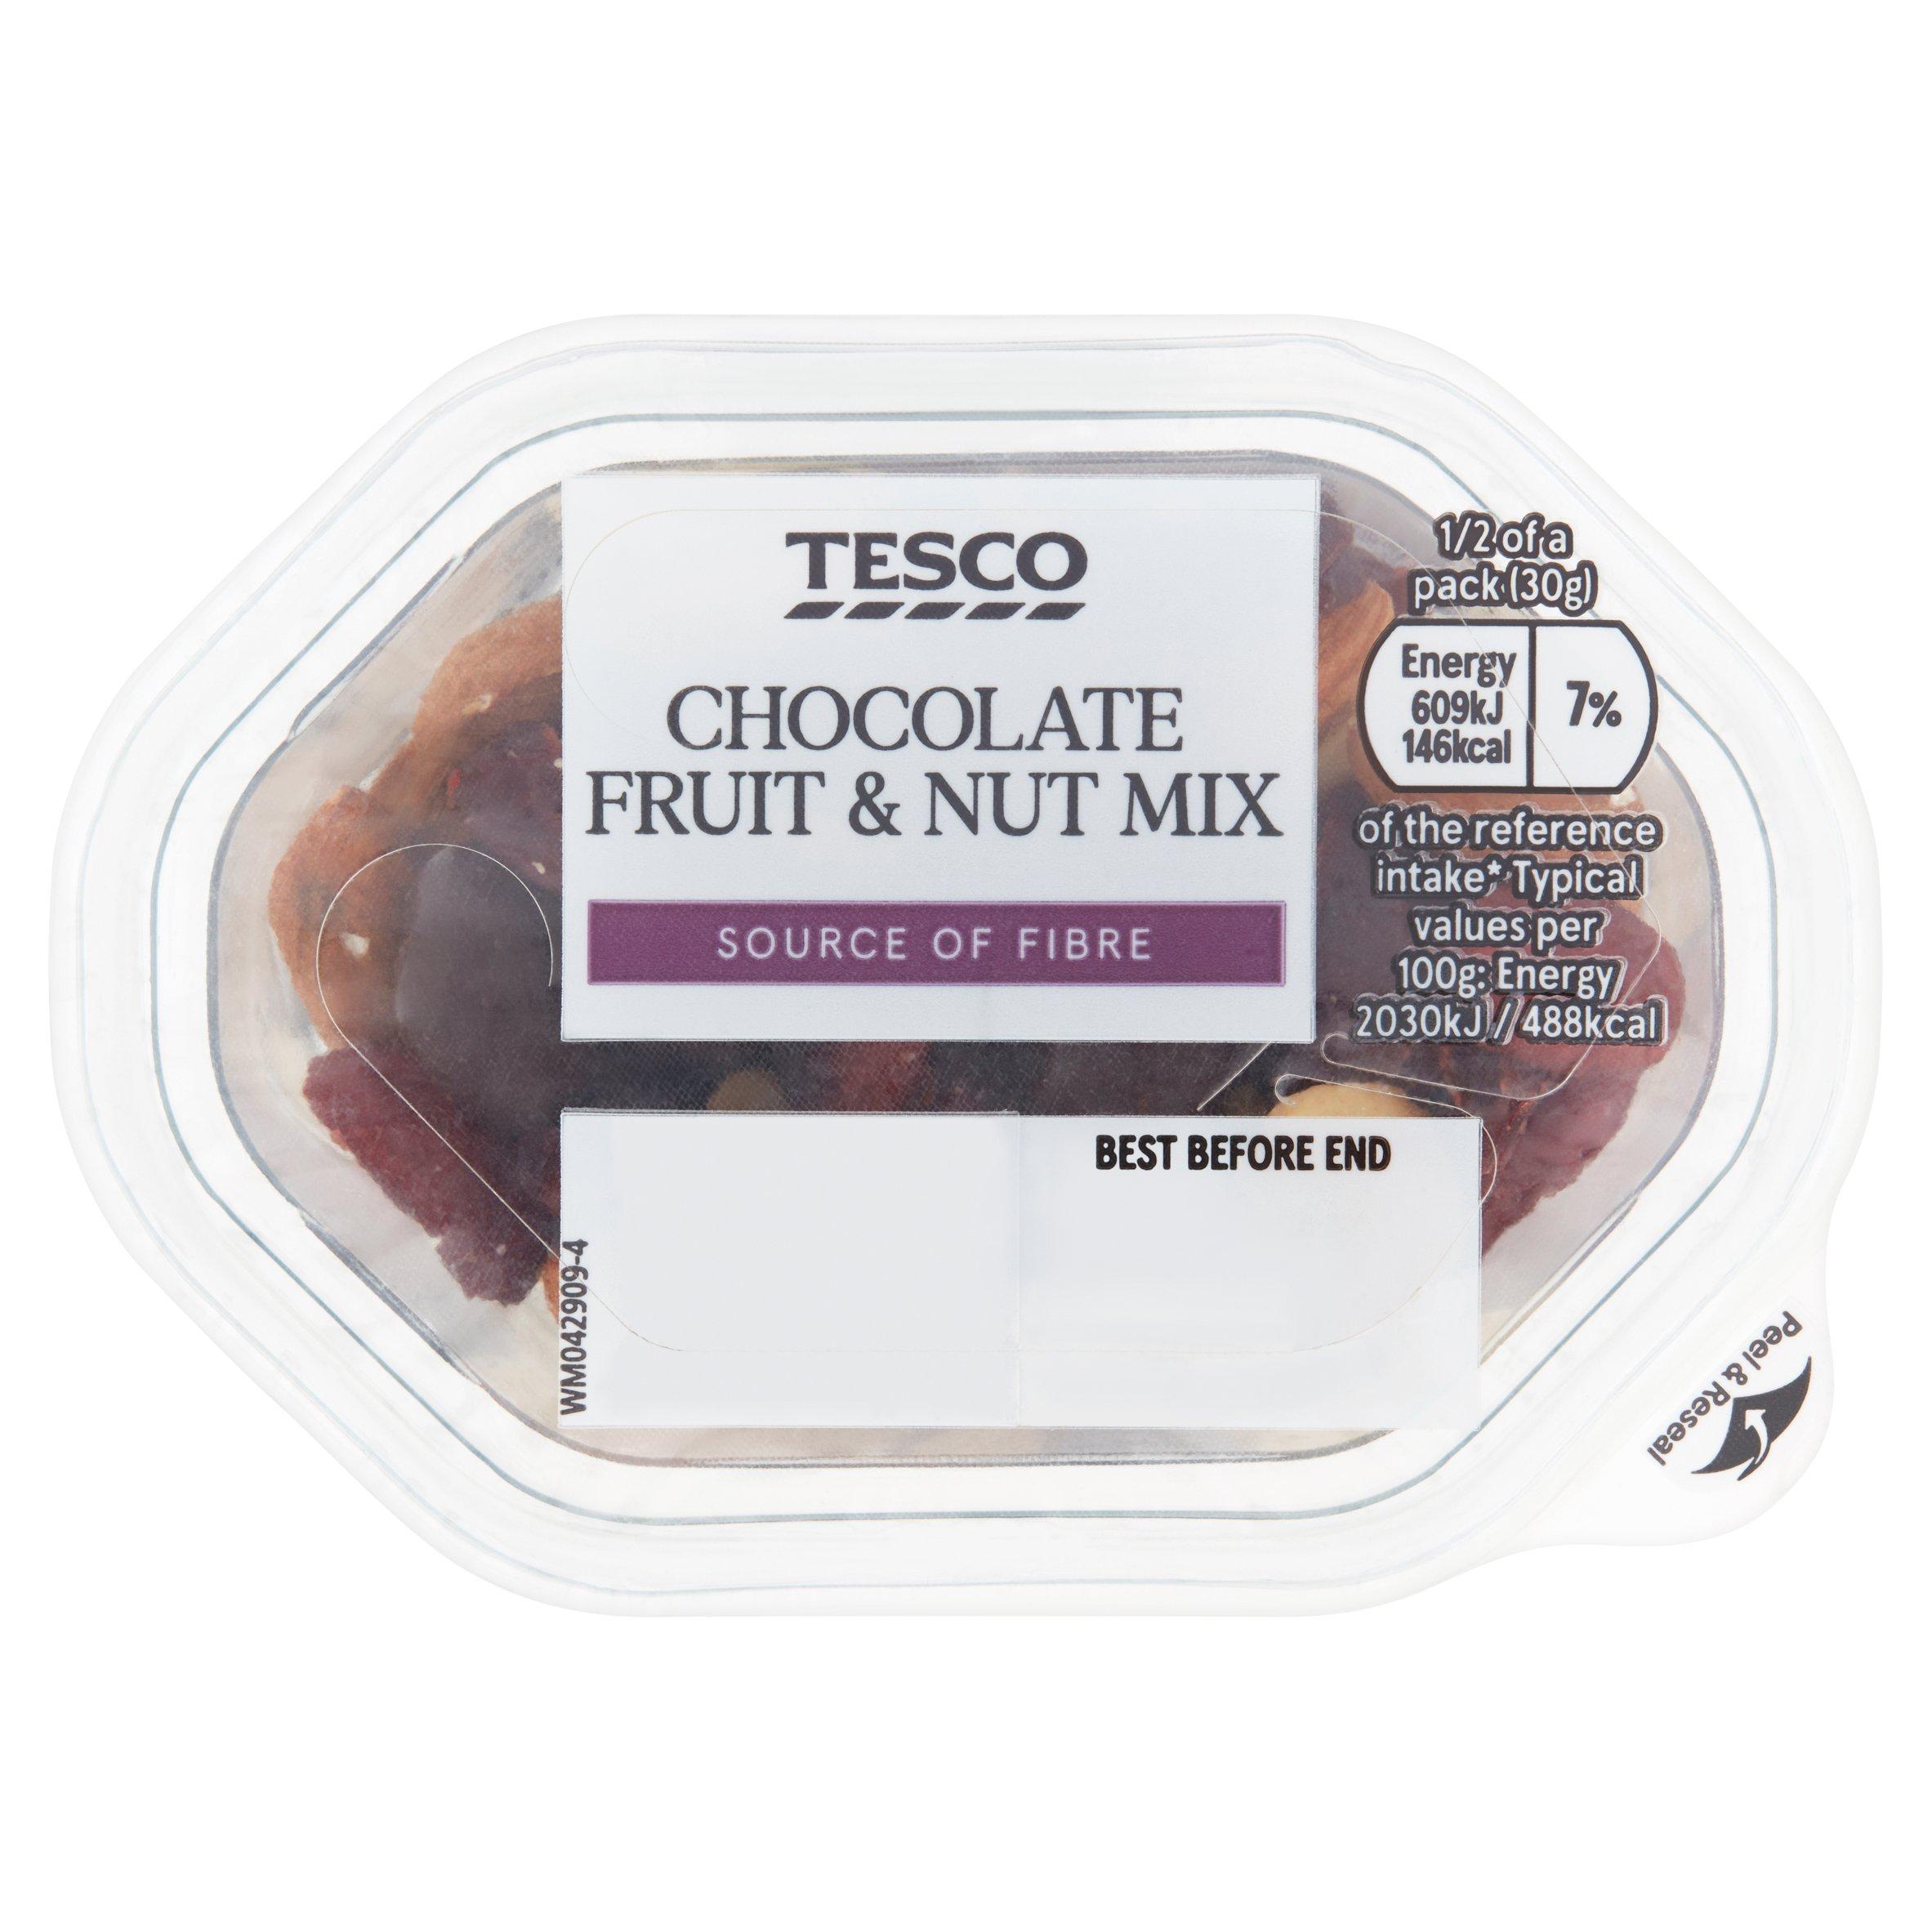 Tesco Chocolate Fruit & Nut Mix Snack Pack 60G